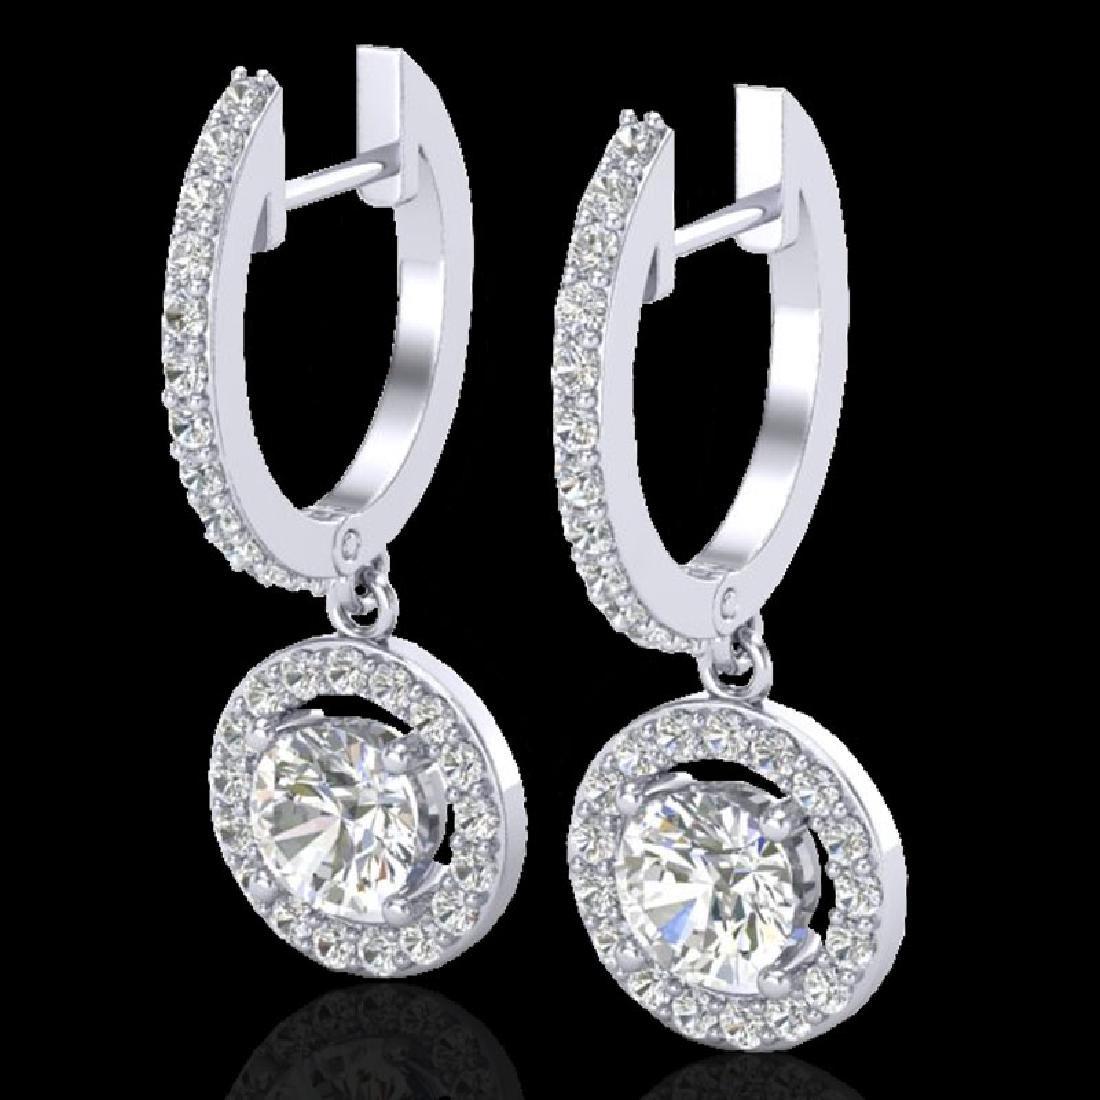 1.75 CTW Micro Pave Halo VS/SI Diamond Earrings 18K